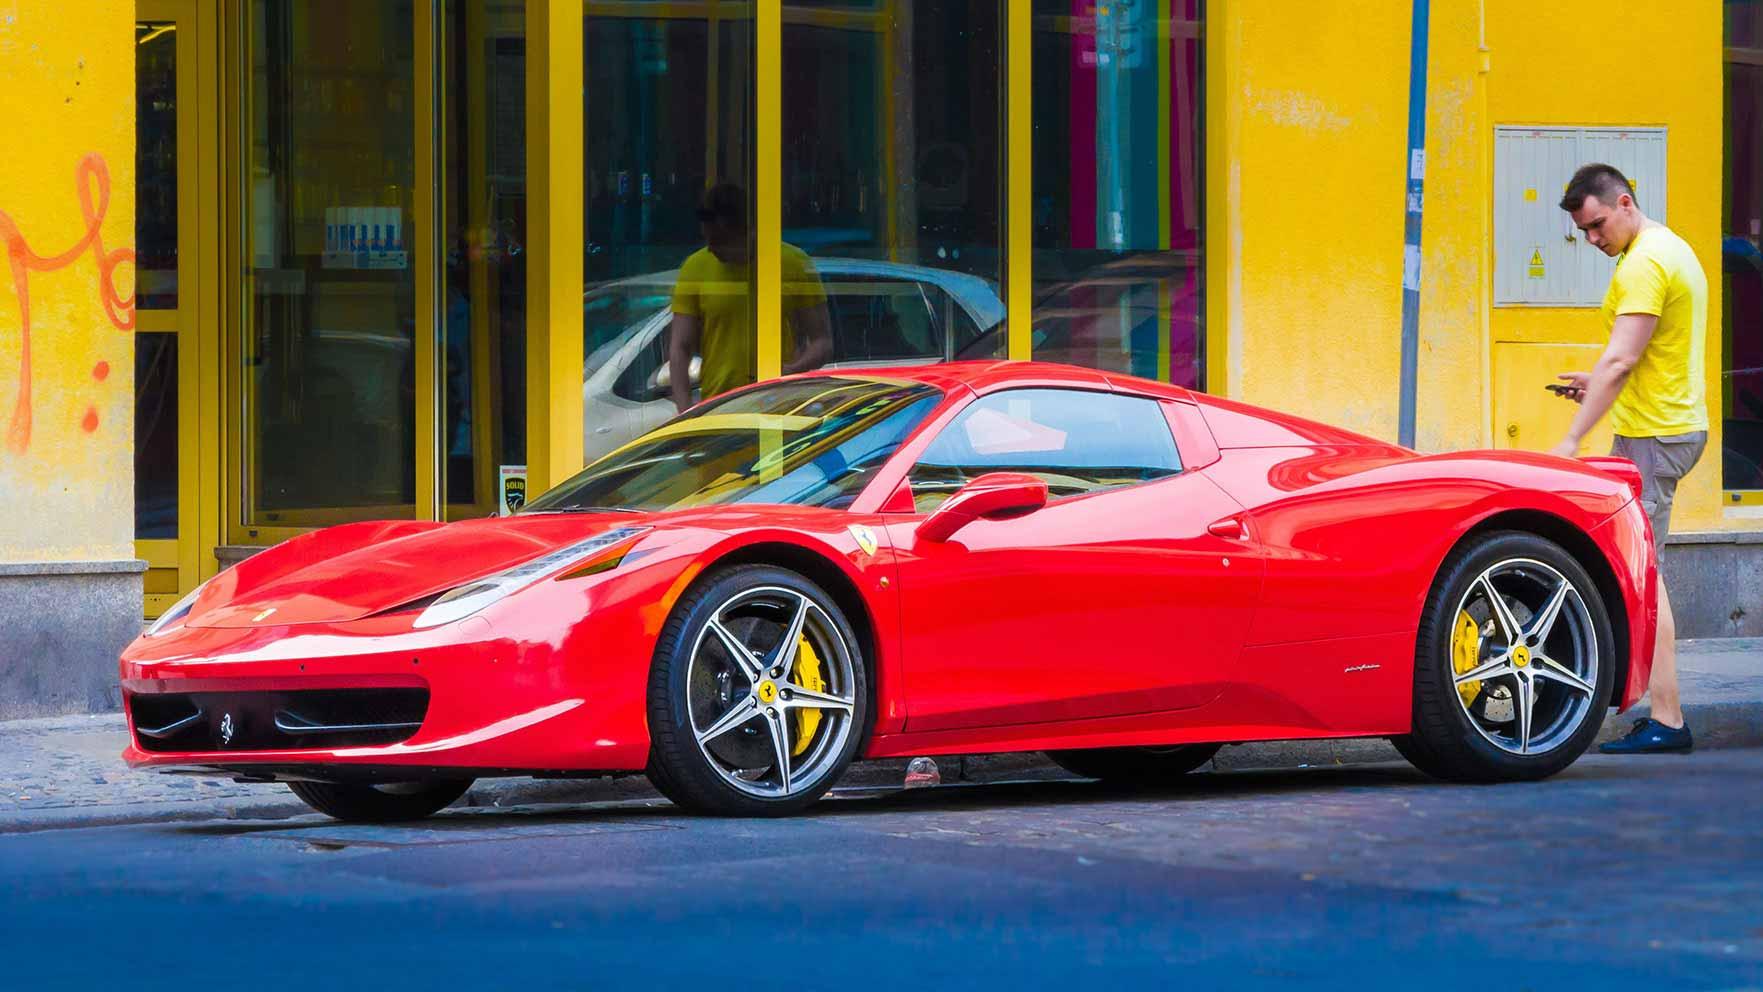 Red Ferrari - that's all